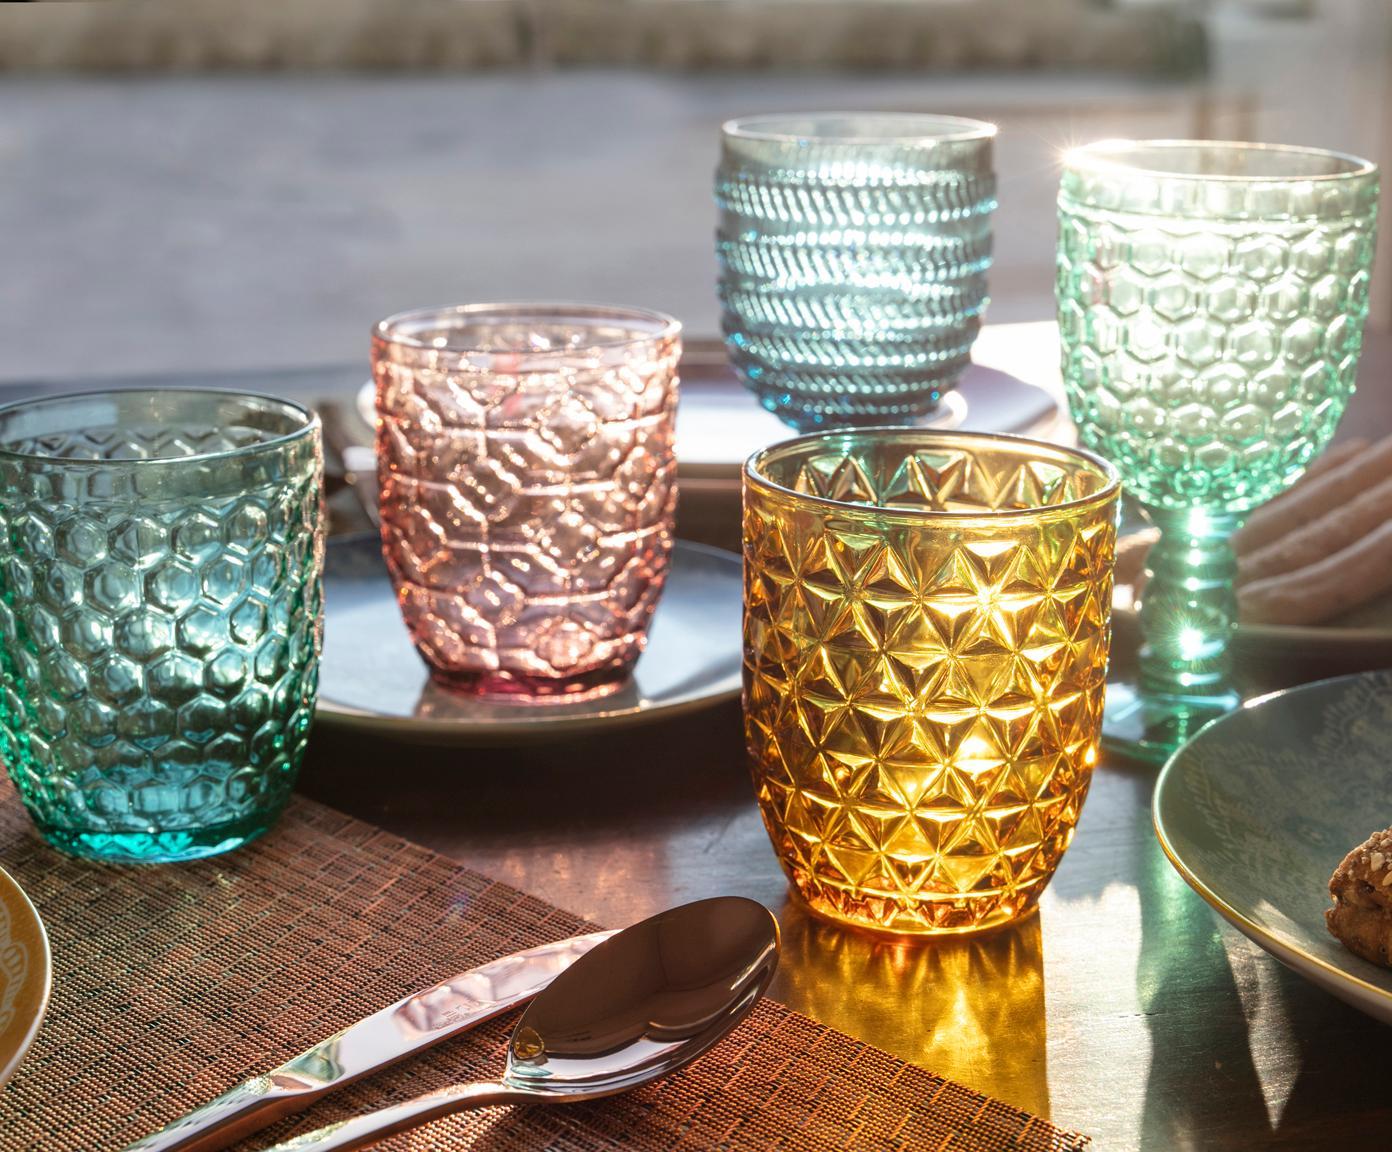 Wassergläser Geometrie mit Strukturmuster in Bunt, 6er-Set, Glas, Blau, Grün, Grau, Rosa, Goldgelb, Transparent, Ø 8 x H 10 cm